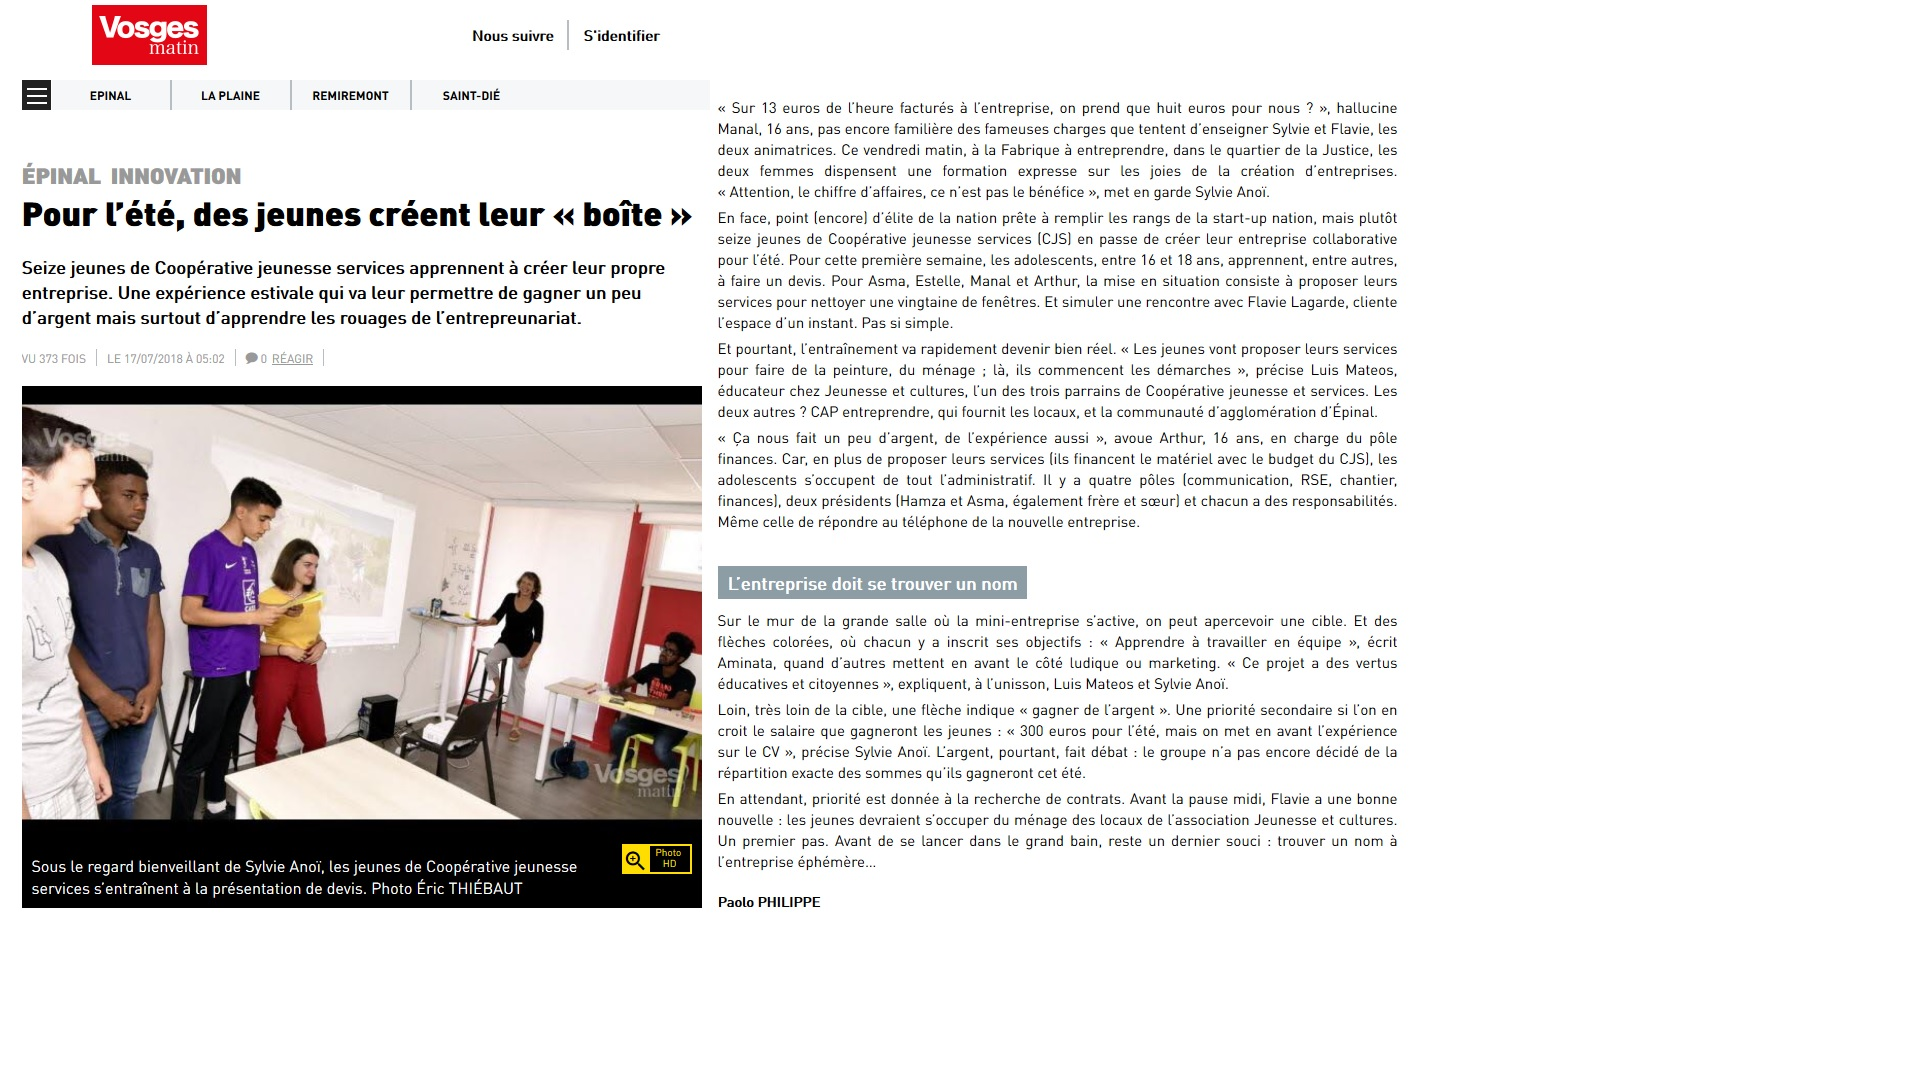 Vosges Matin_CJS_EPINAL_17_07_18